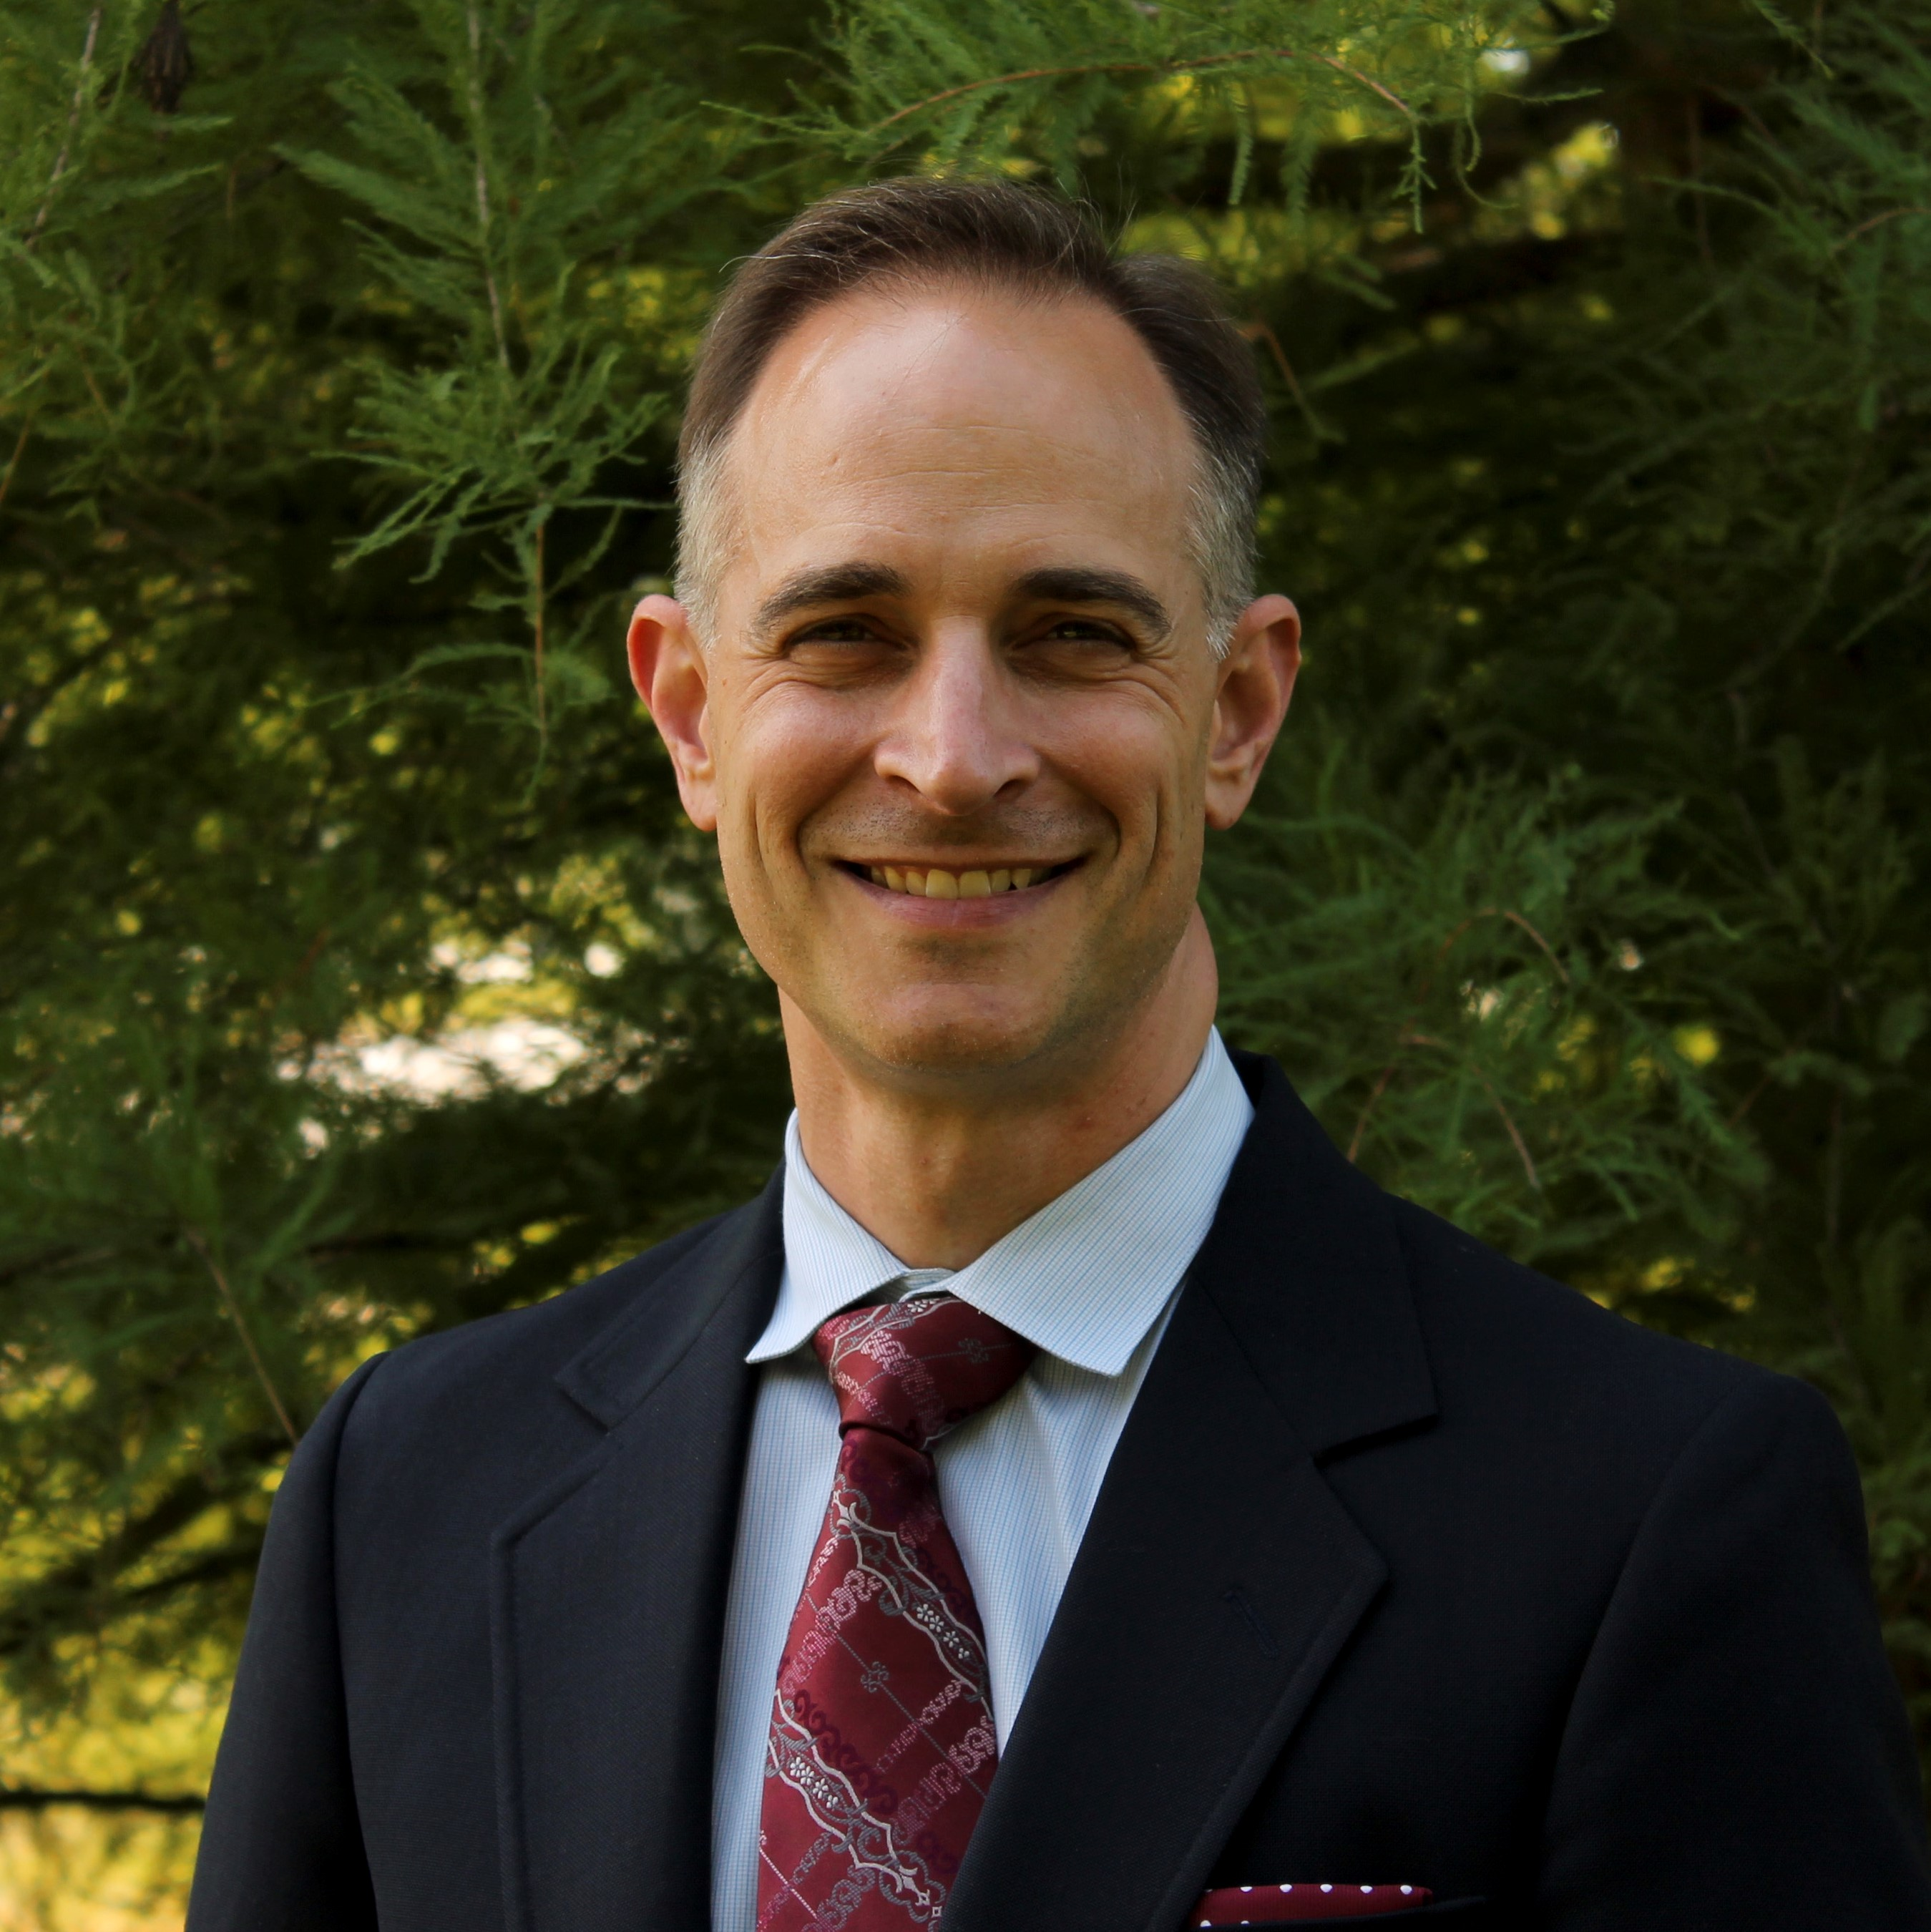 Patrick Egan, Dean of the Upper School at Clapham School in Wheaton, IL